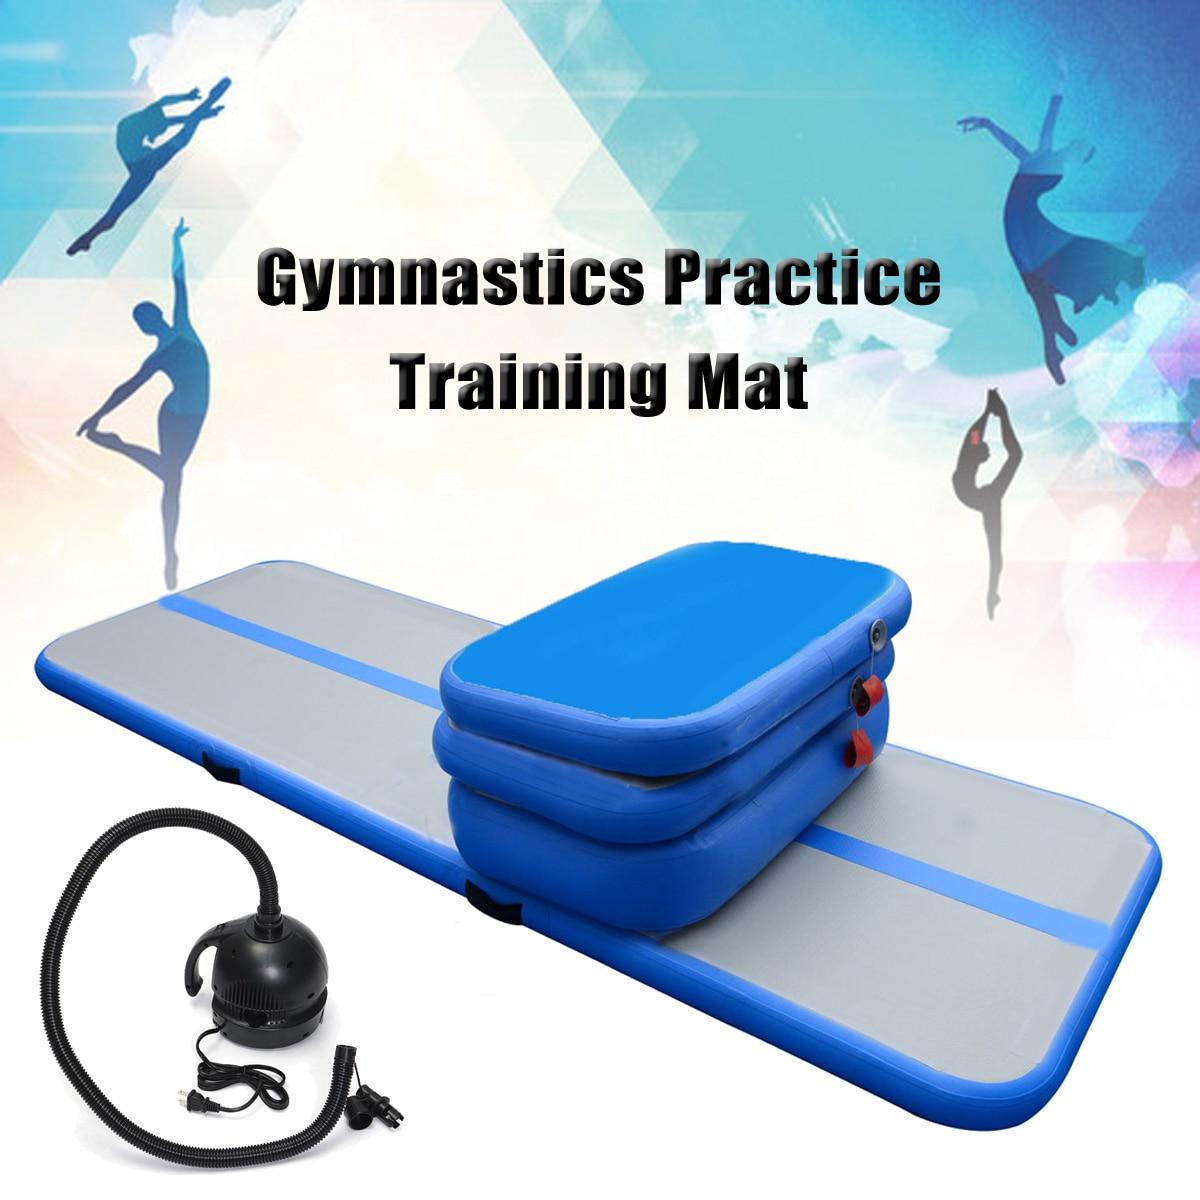 1M Inflatable GYM Gymnastics Air Track Tumbling Practice Training Mat Pad Set gofun airtrack 100x60x10cm portable air track tumbling training mat gymnastics exercise pad inflatable gym training mats